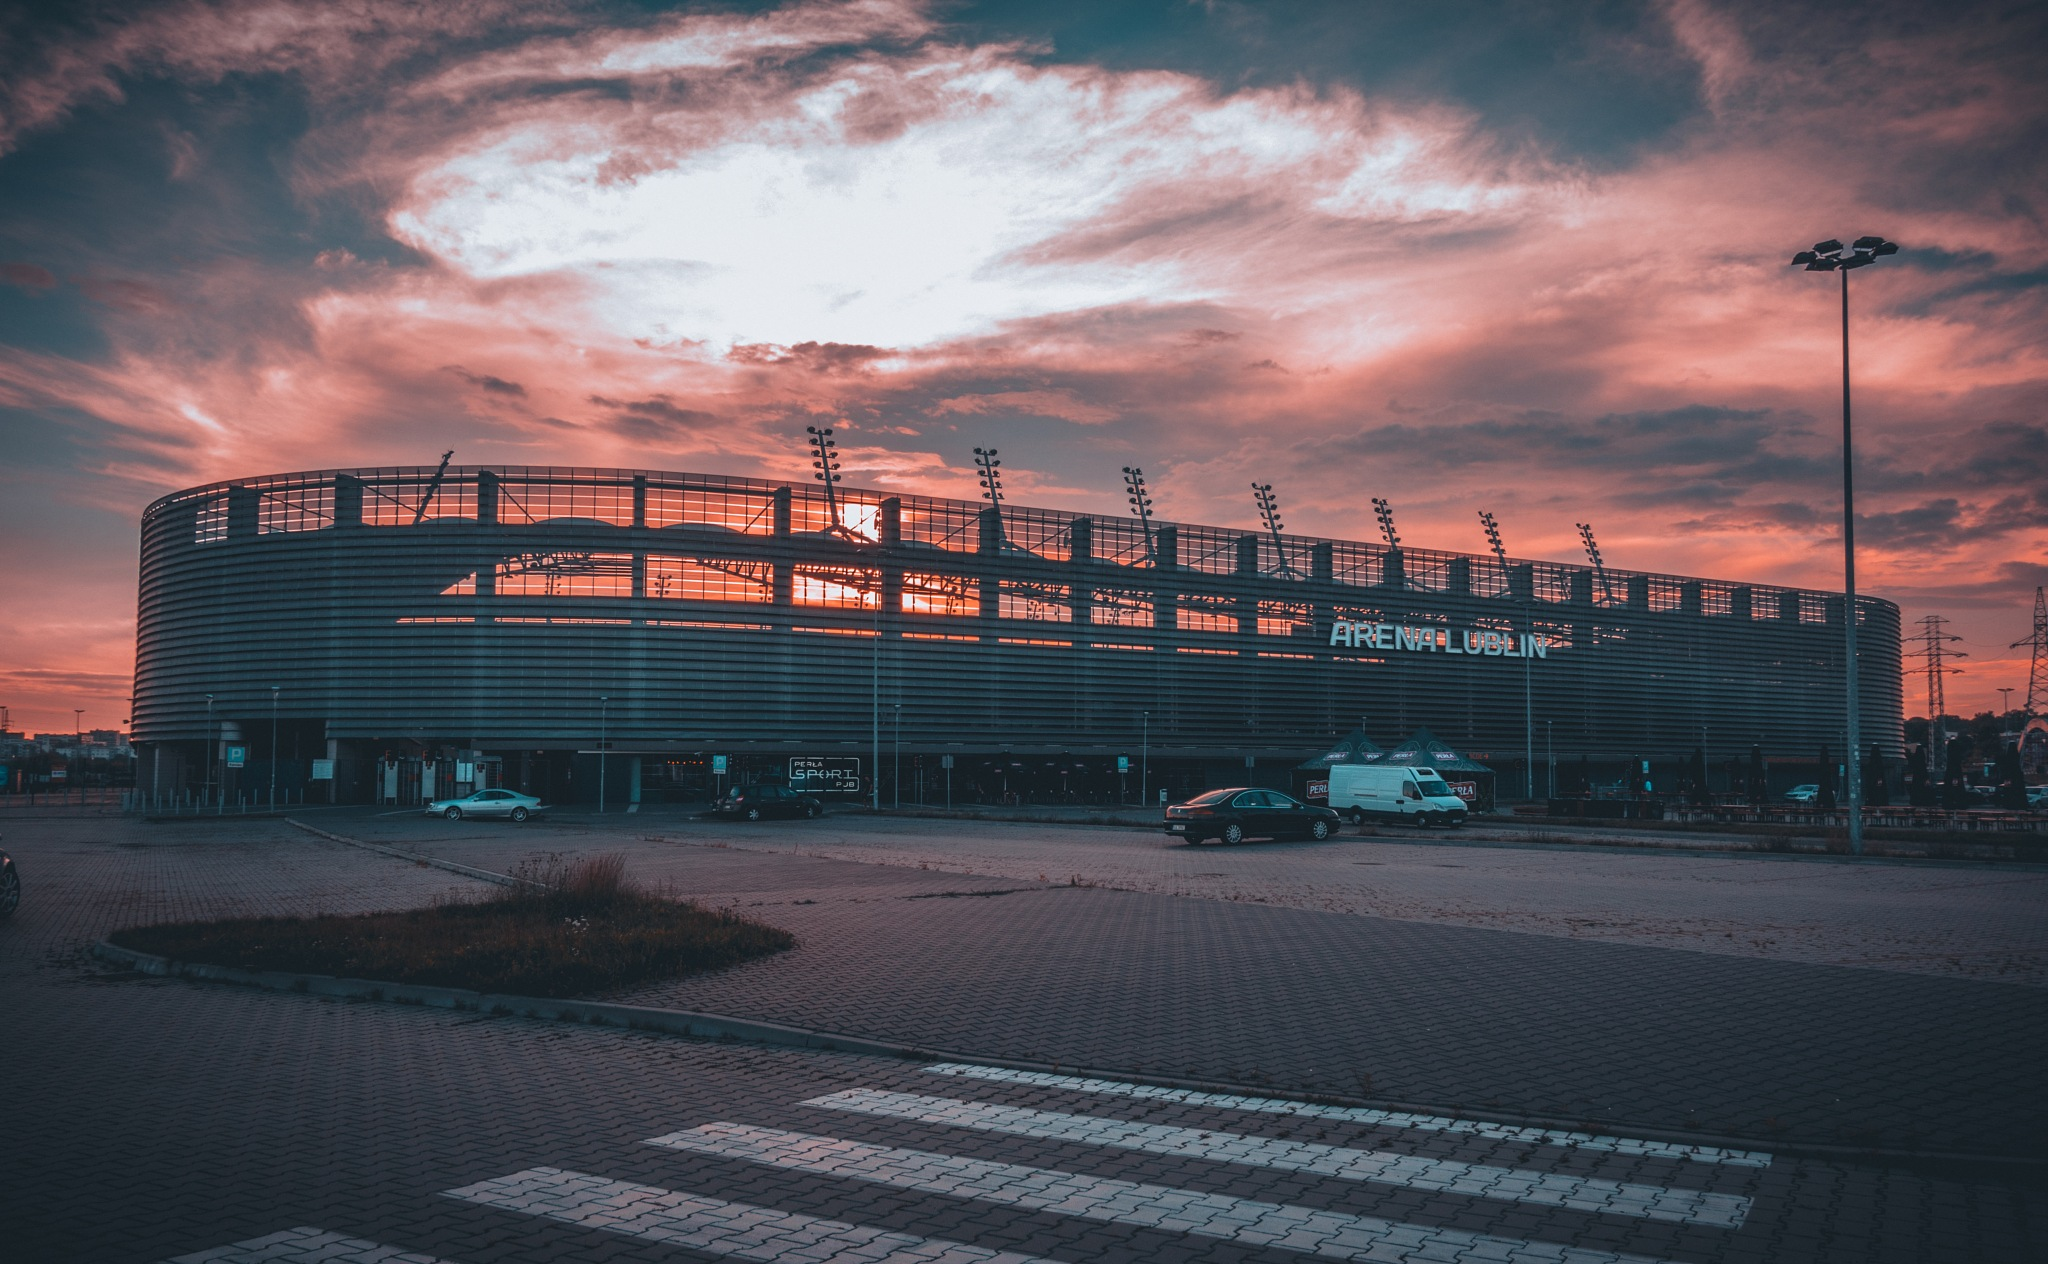 Stadion  by Tomasz